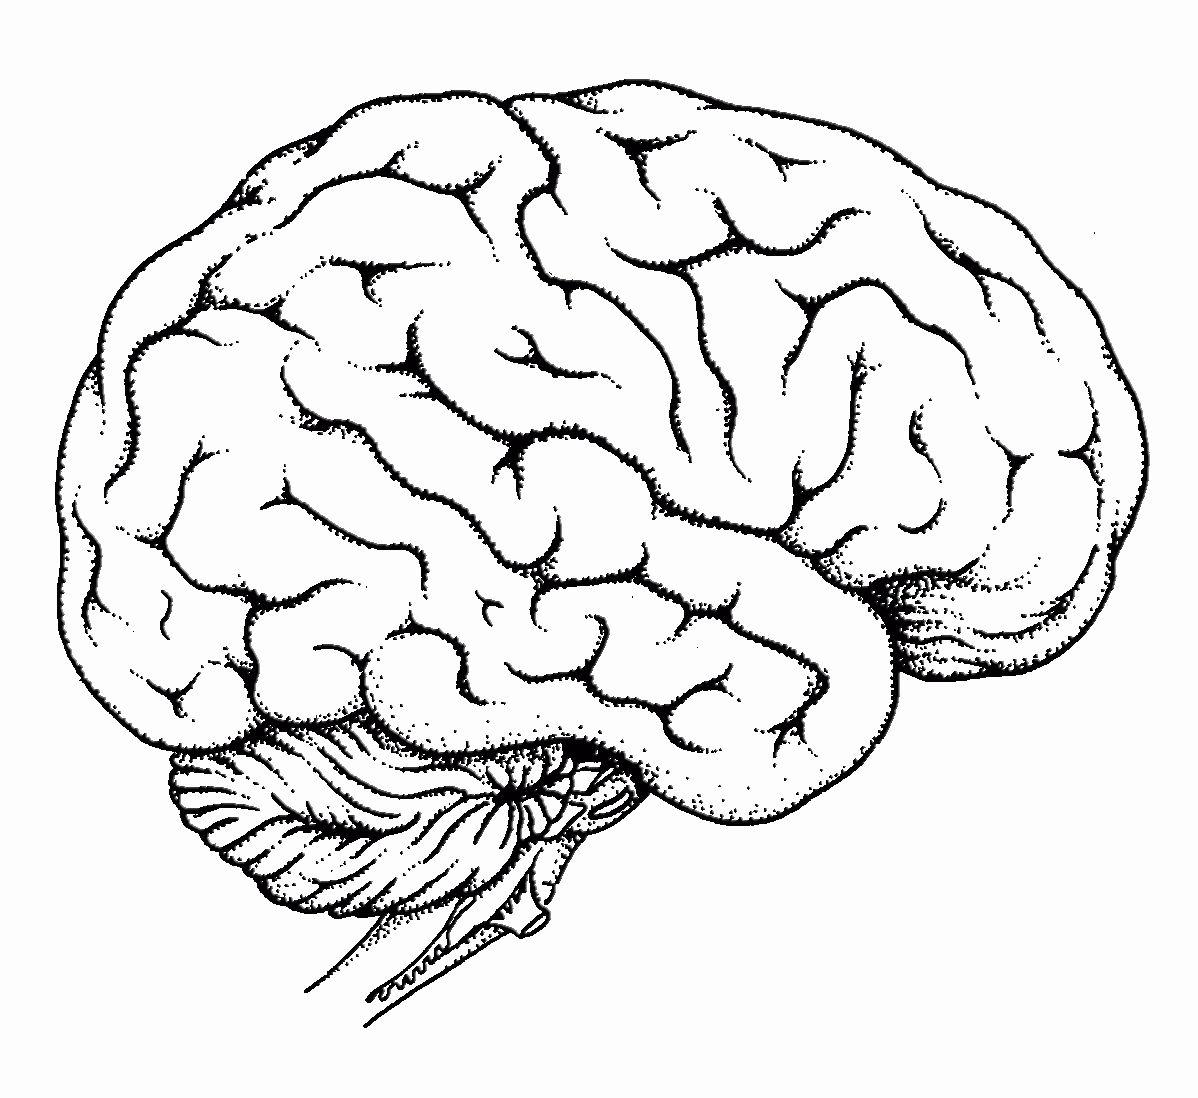 Human Brain Coloring Book Beautiful Human Brain Coloring Page Coloring Home In 2020 Brain Drawing Brain Art Brain Diagram